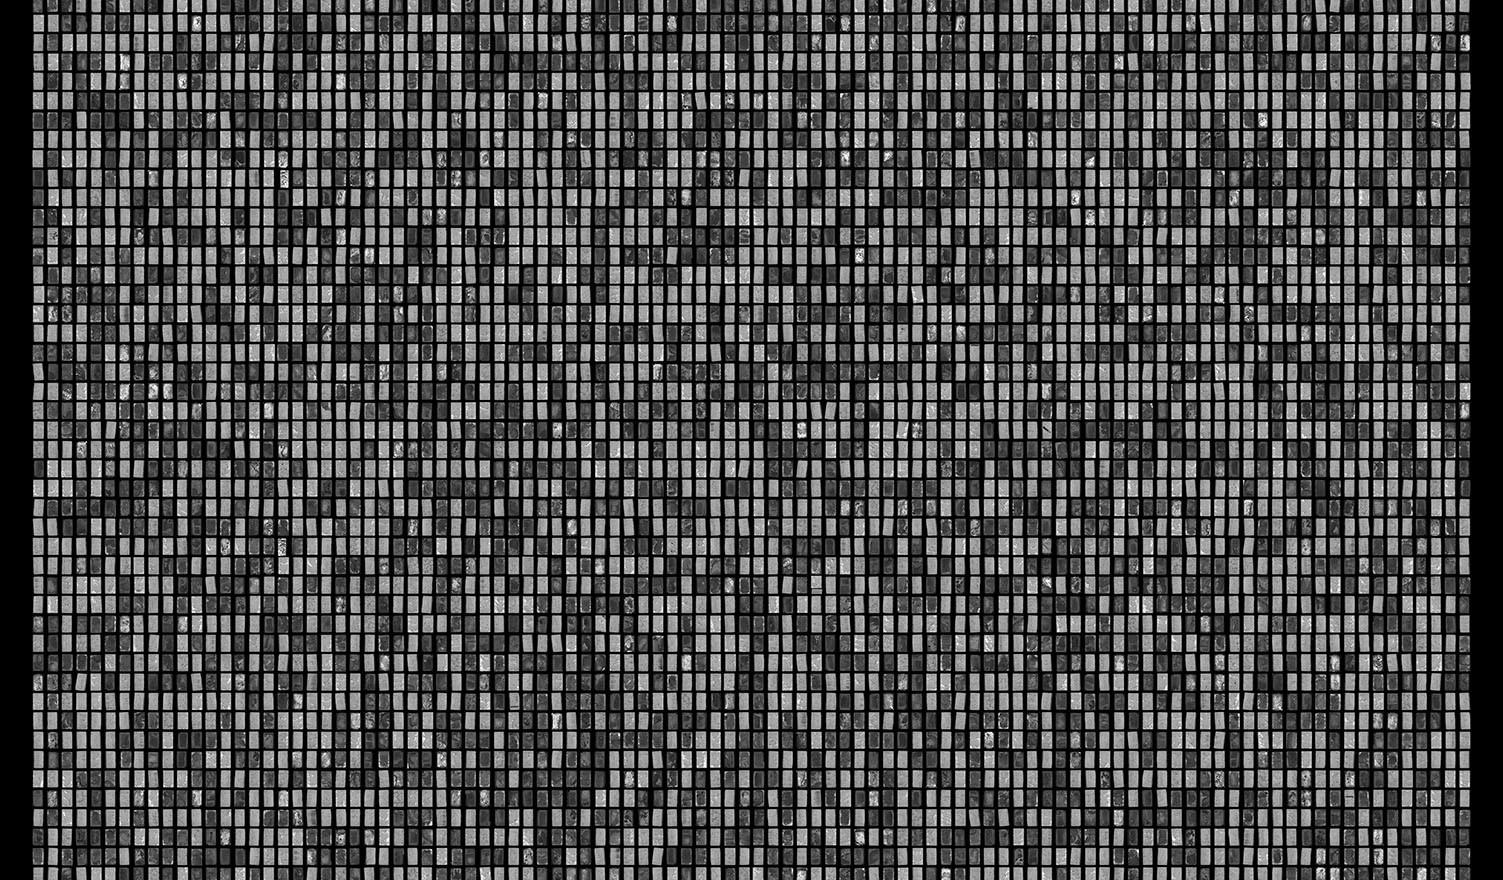 Society 018 193x145cm 145x110cm Pigment Inkjet  2017